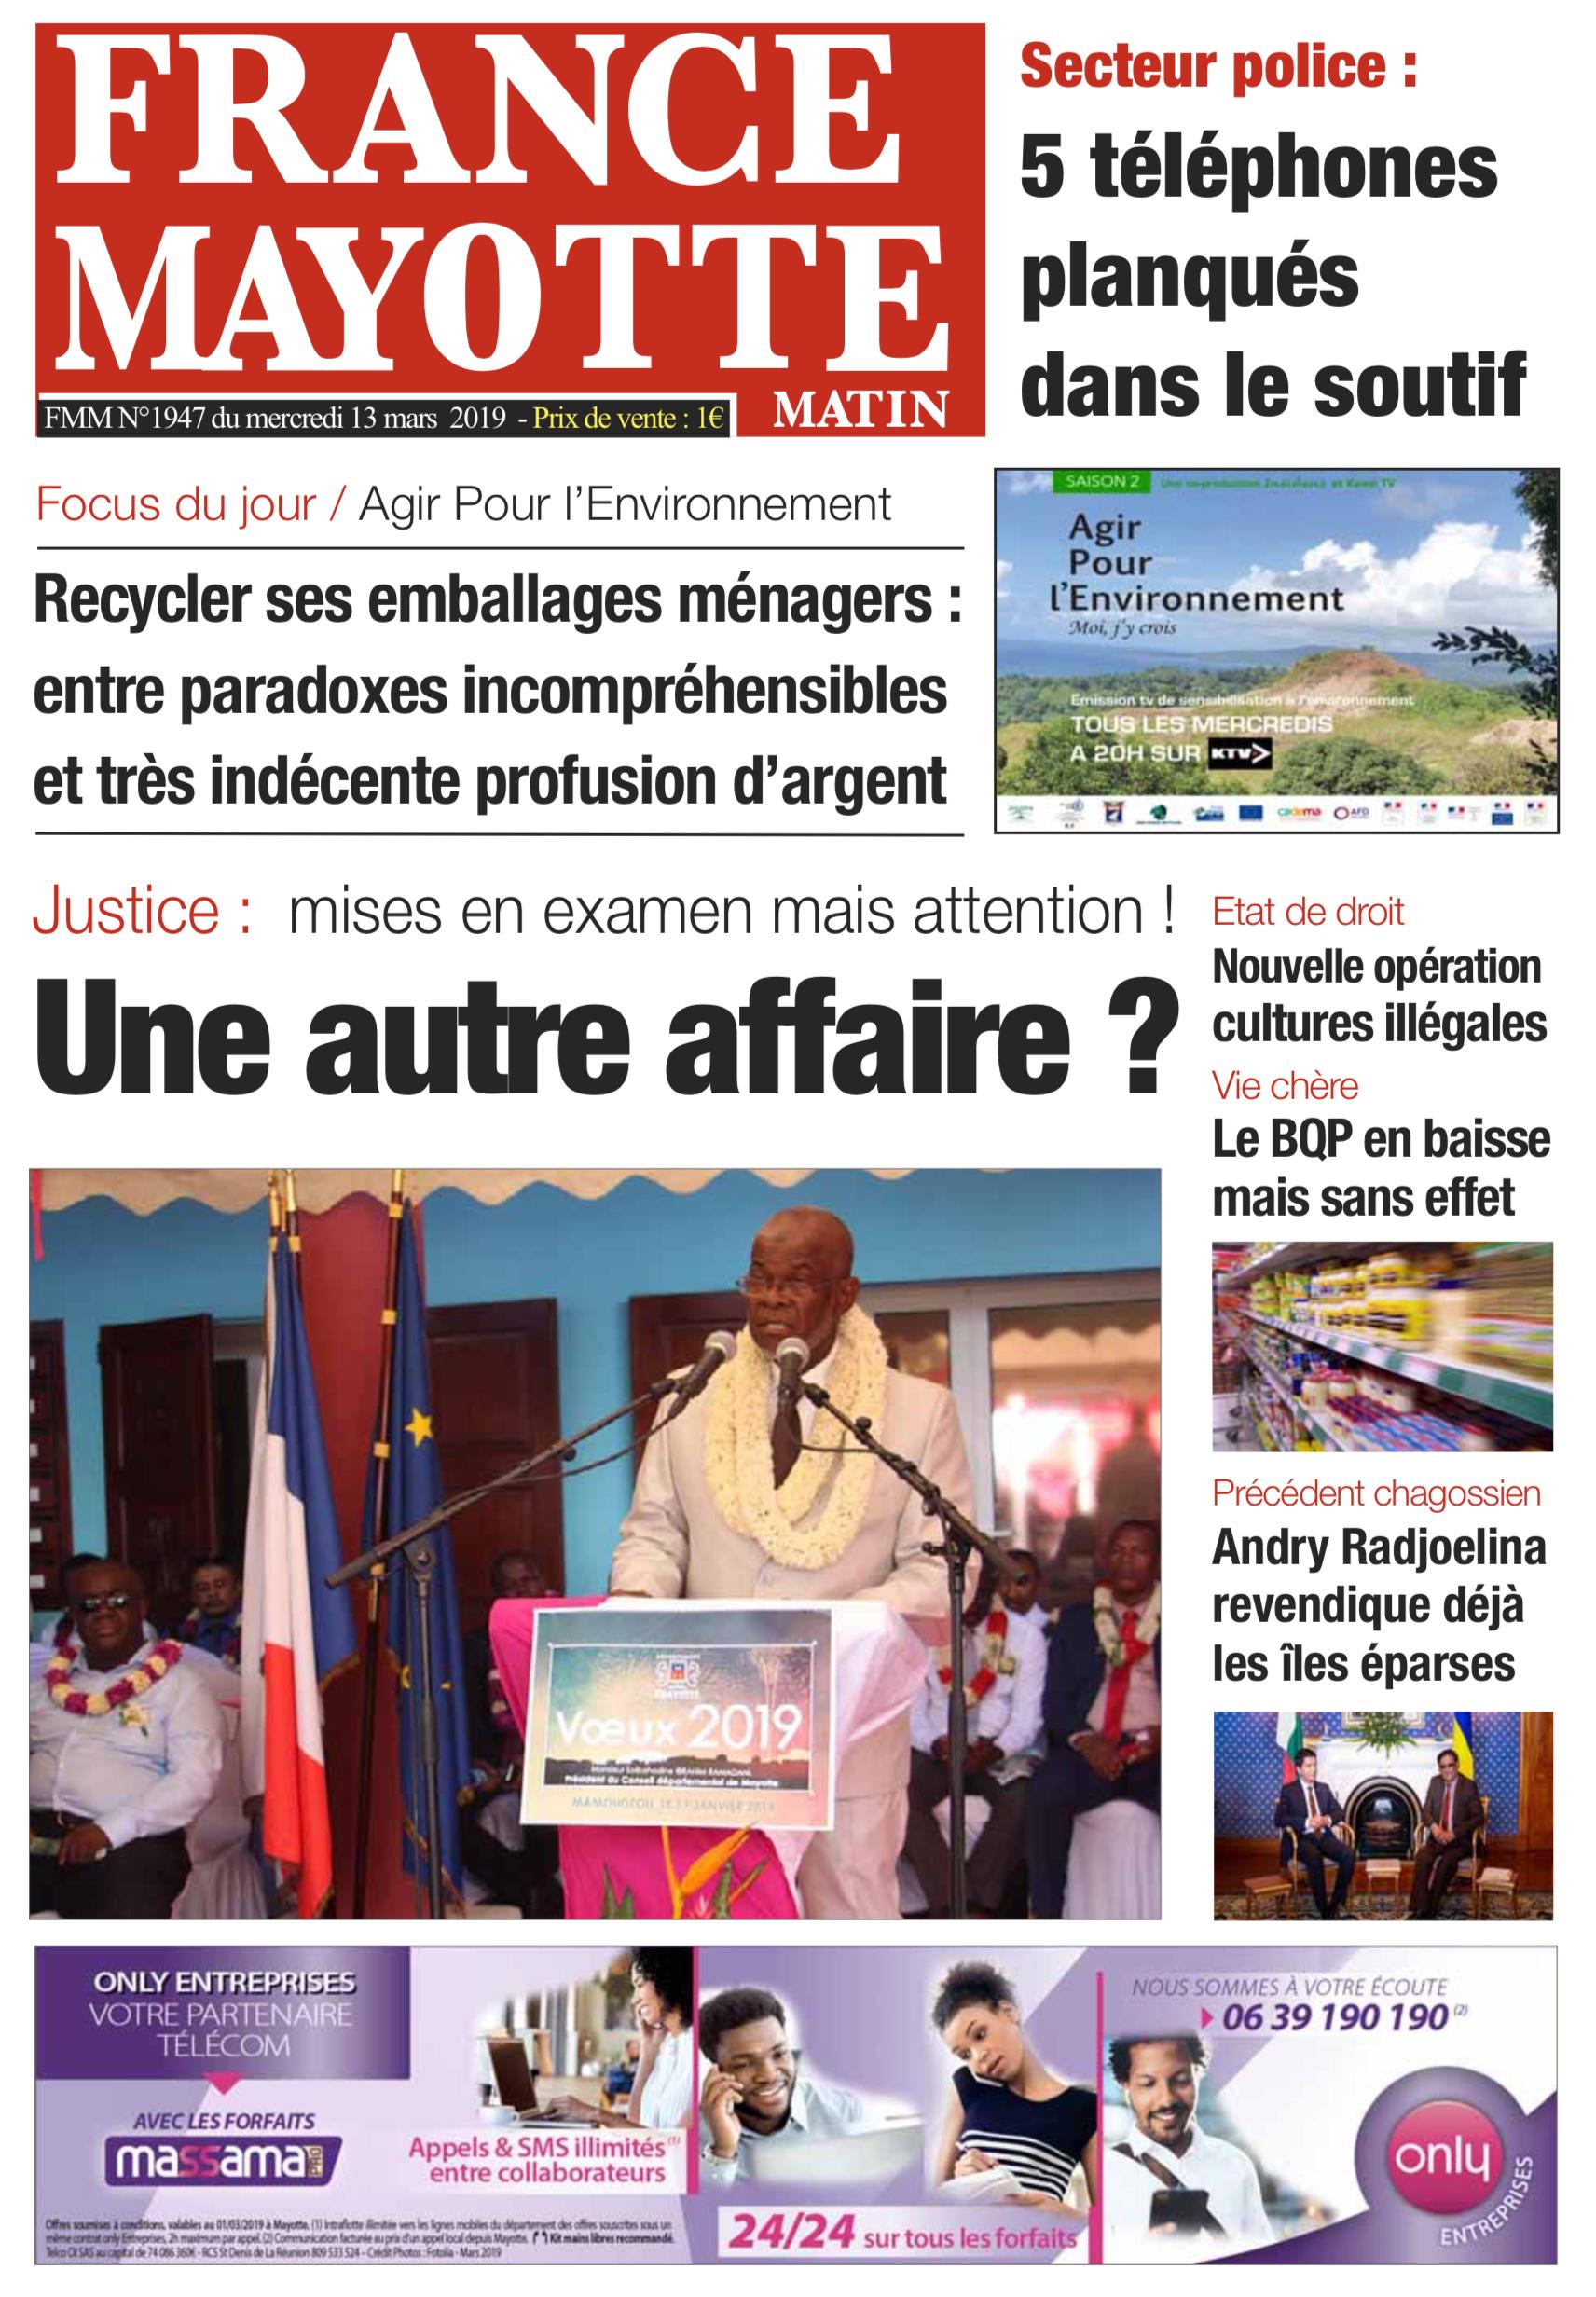 France Mayotte Mercredi 13 mars 2019